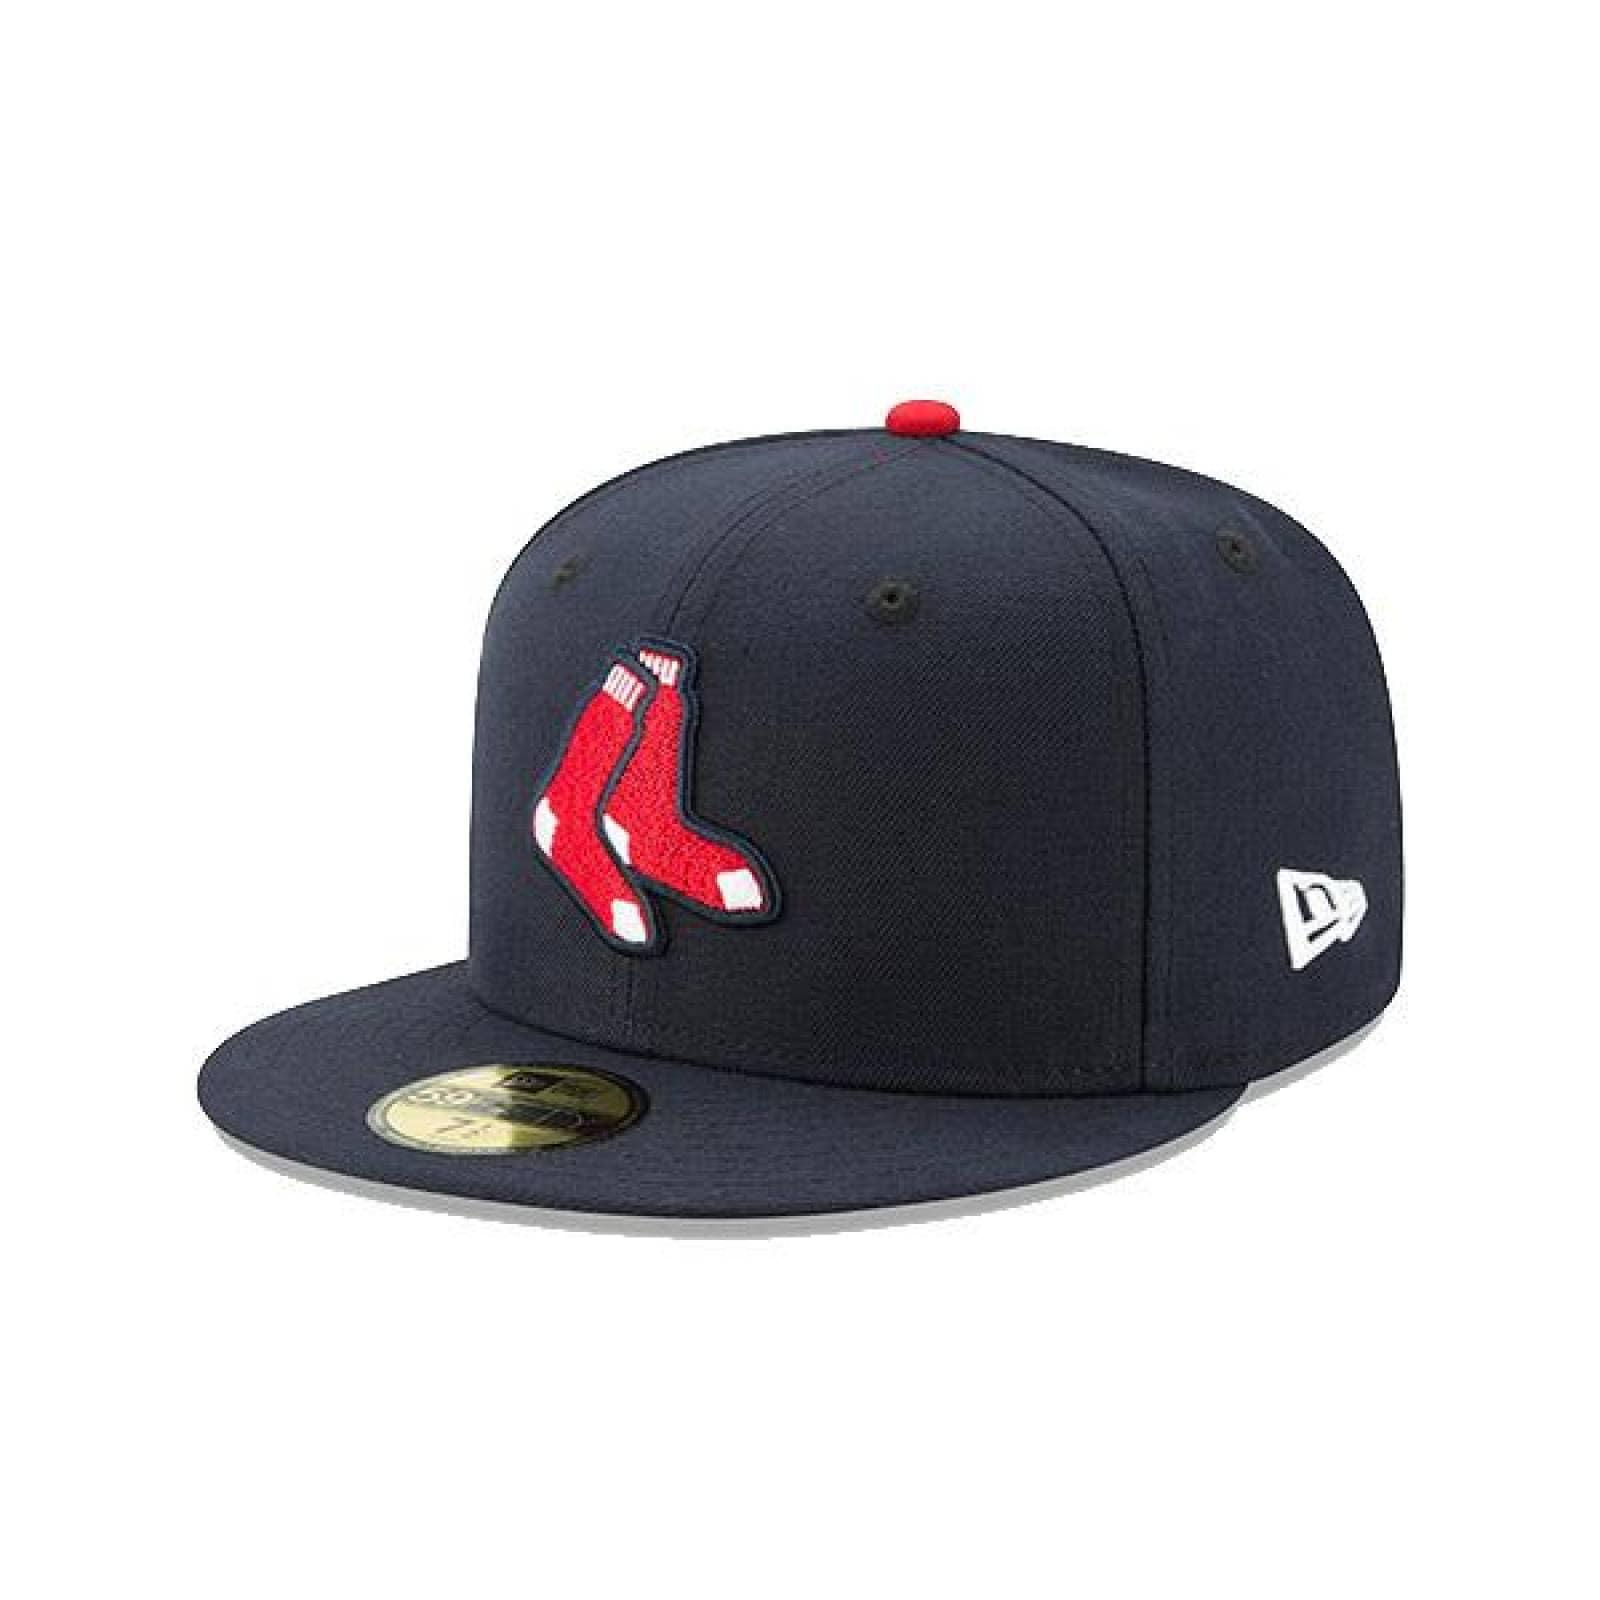 Gorra New Era 5950 MLB Boston Red Sox Alterna Azul